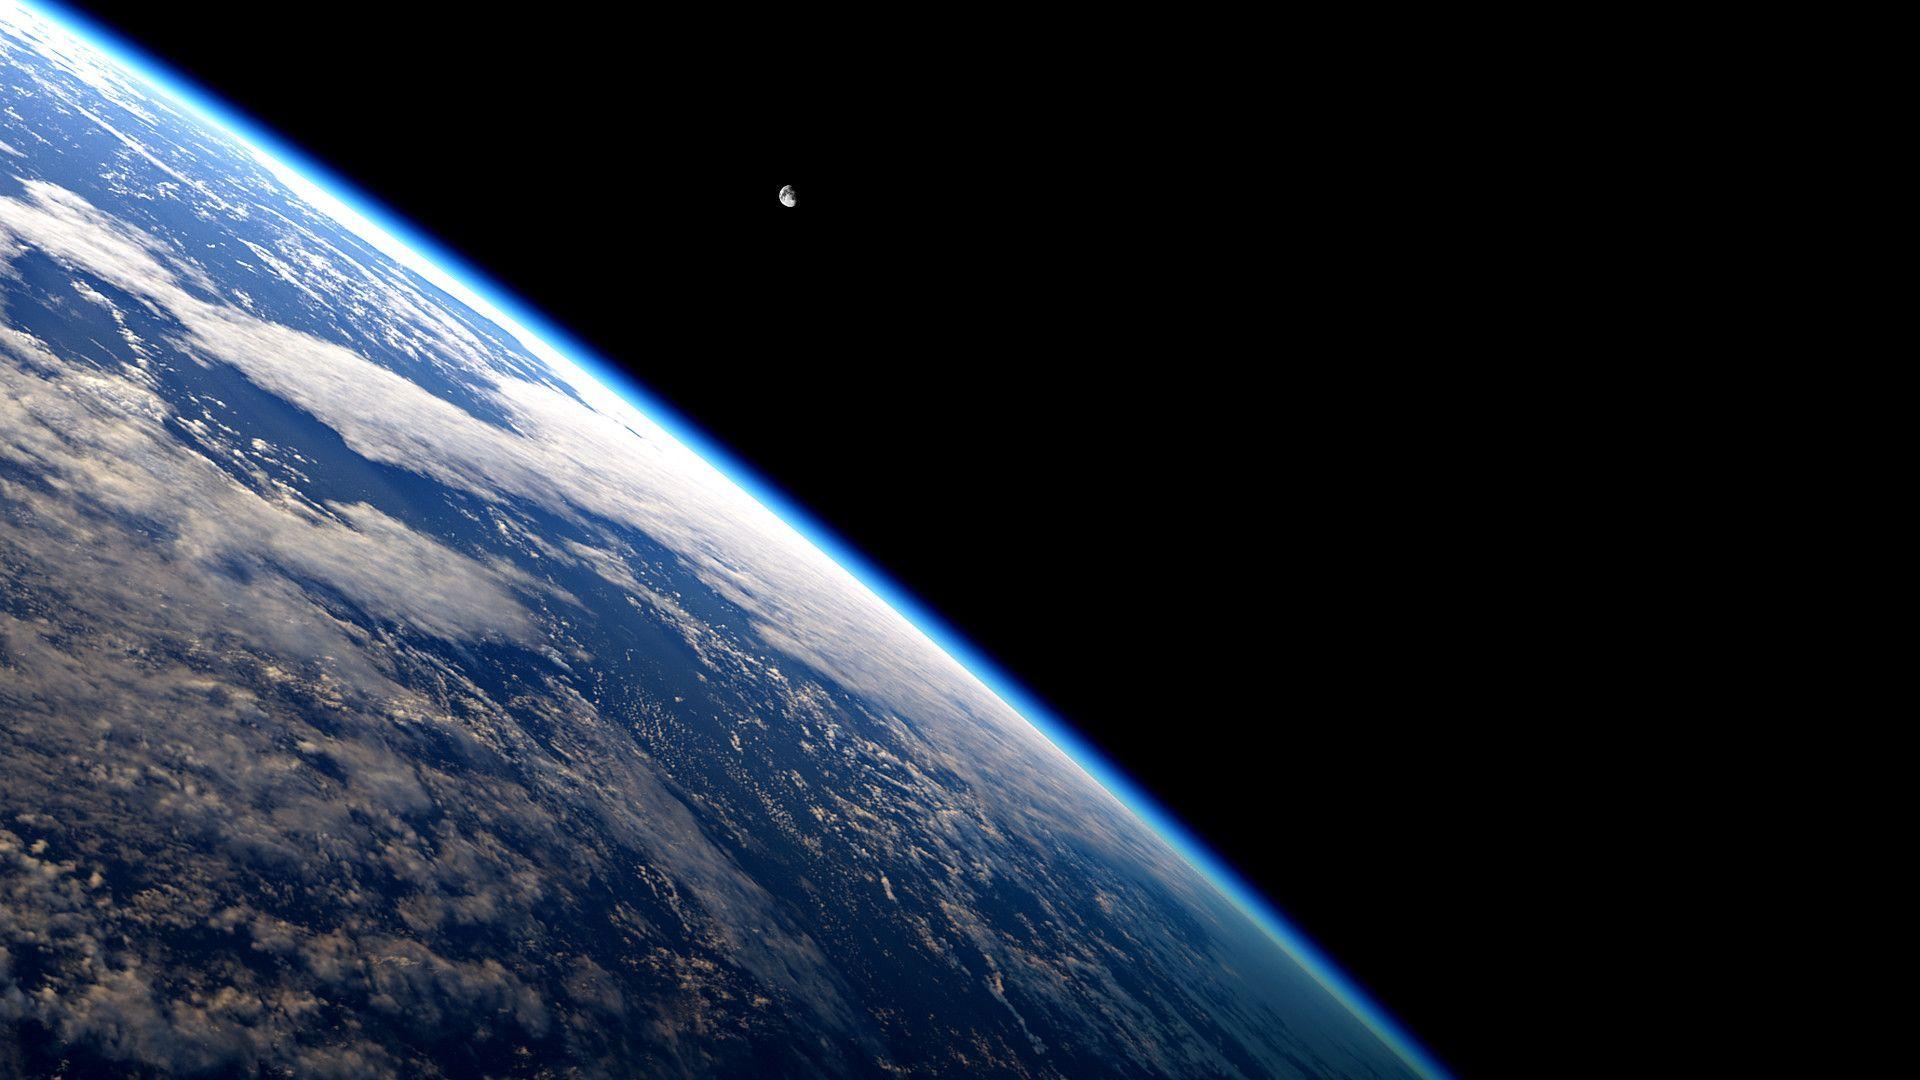 Earth wallpaper hd 23100 1920x1080 px hdwallsource earth wallpaper hd 23100 voltagebd Images